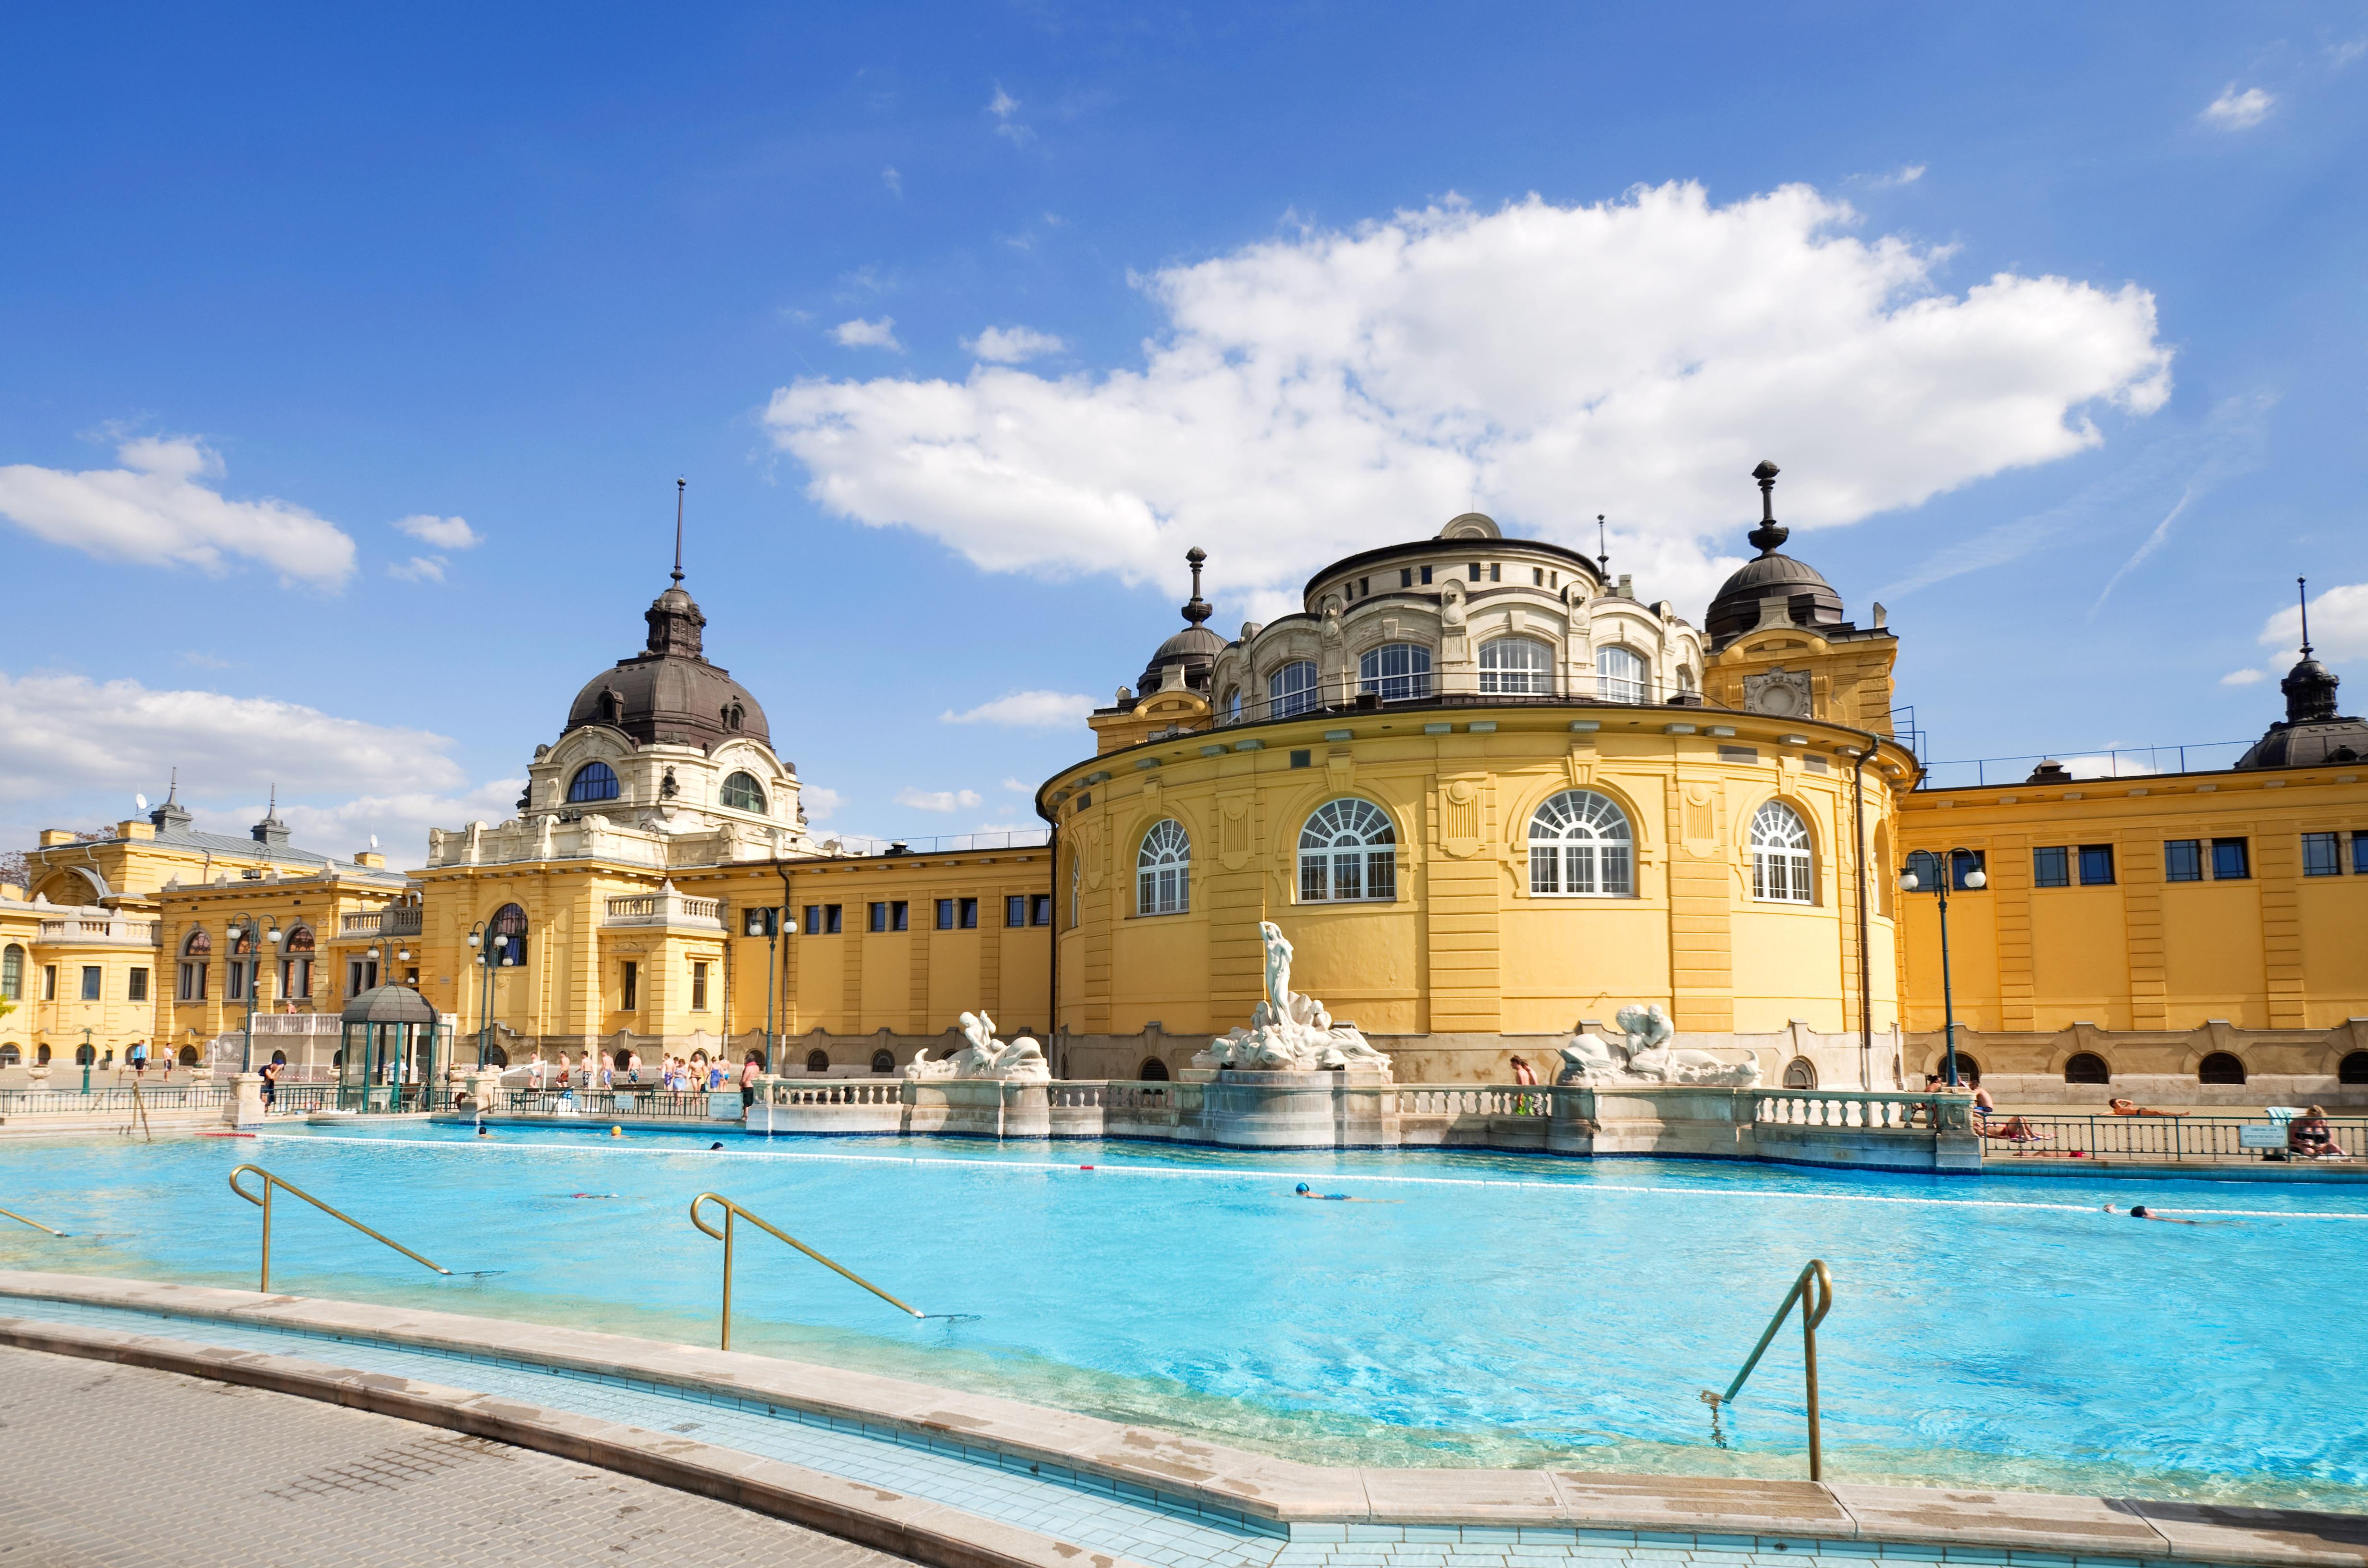 Budapest Royal Castle